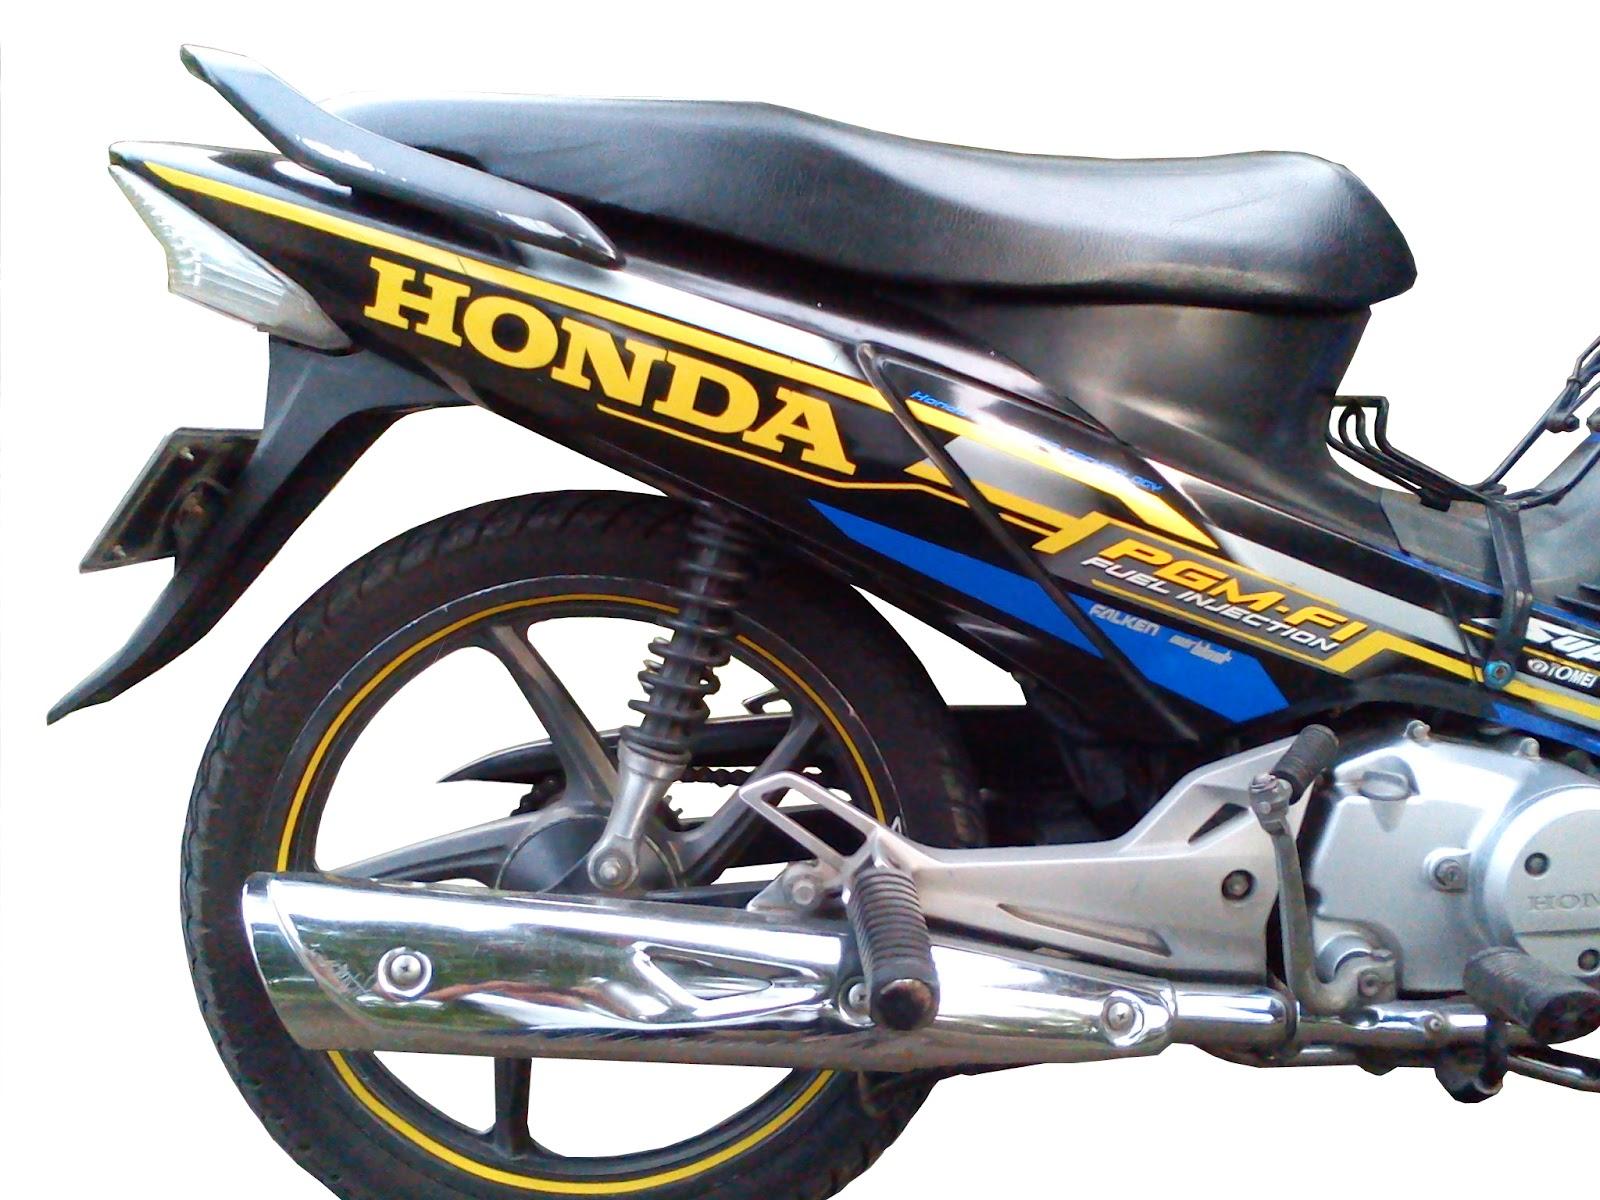 honda pgm-fi 125 fuel injection sepeda motorku ...